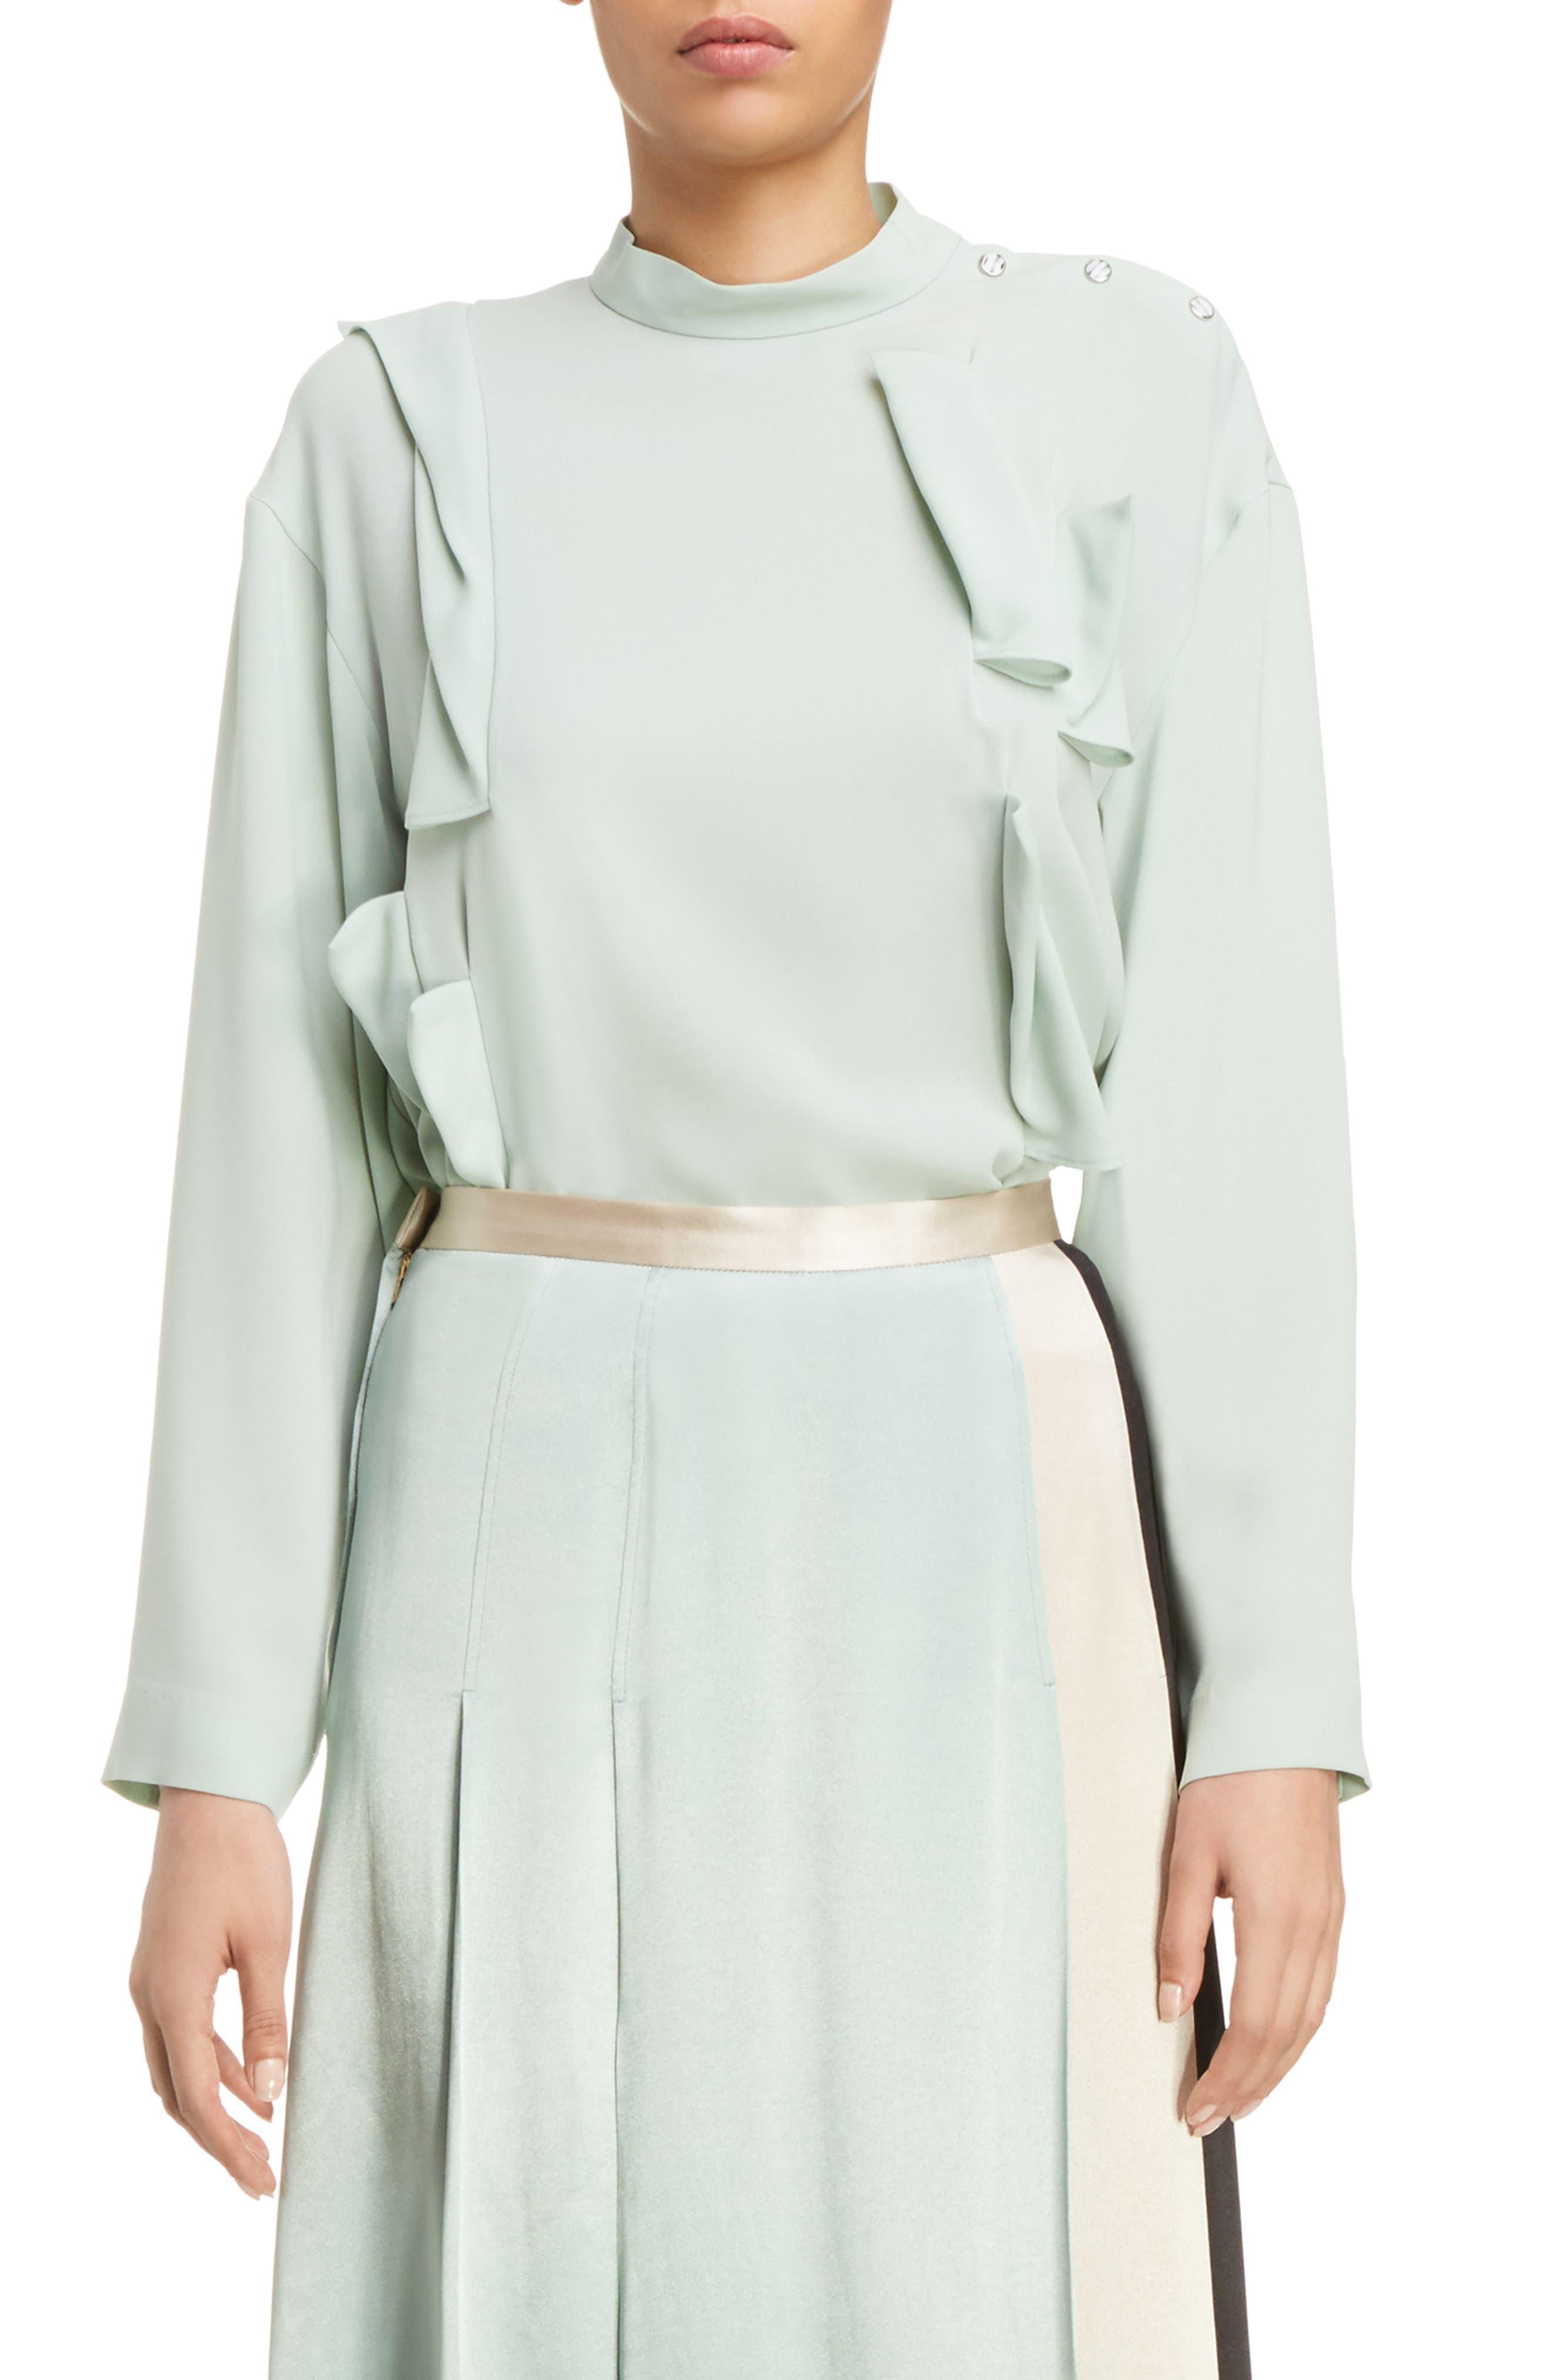 Georgette Satin Shirt,                         Main,                         color, Light Green